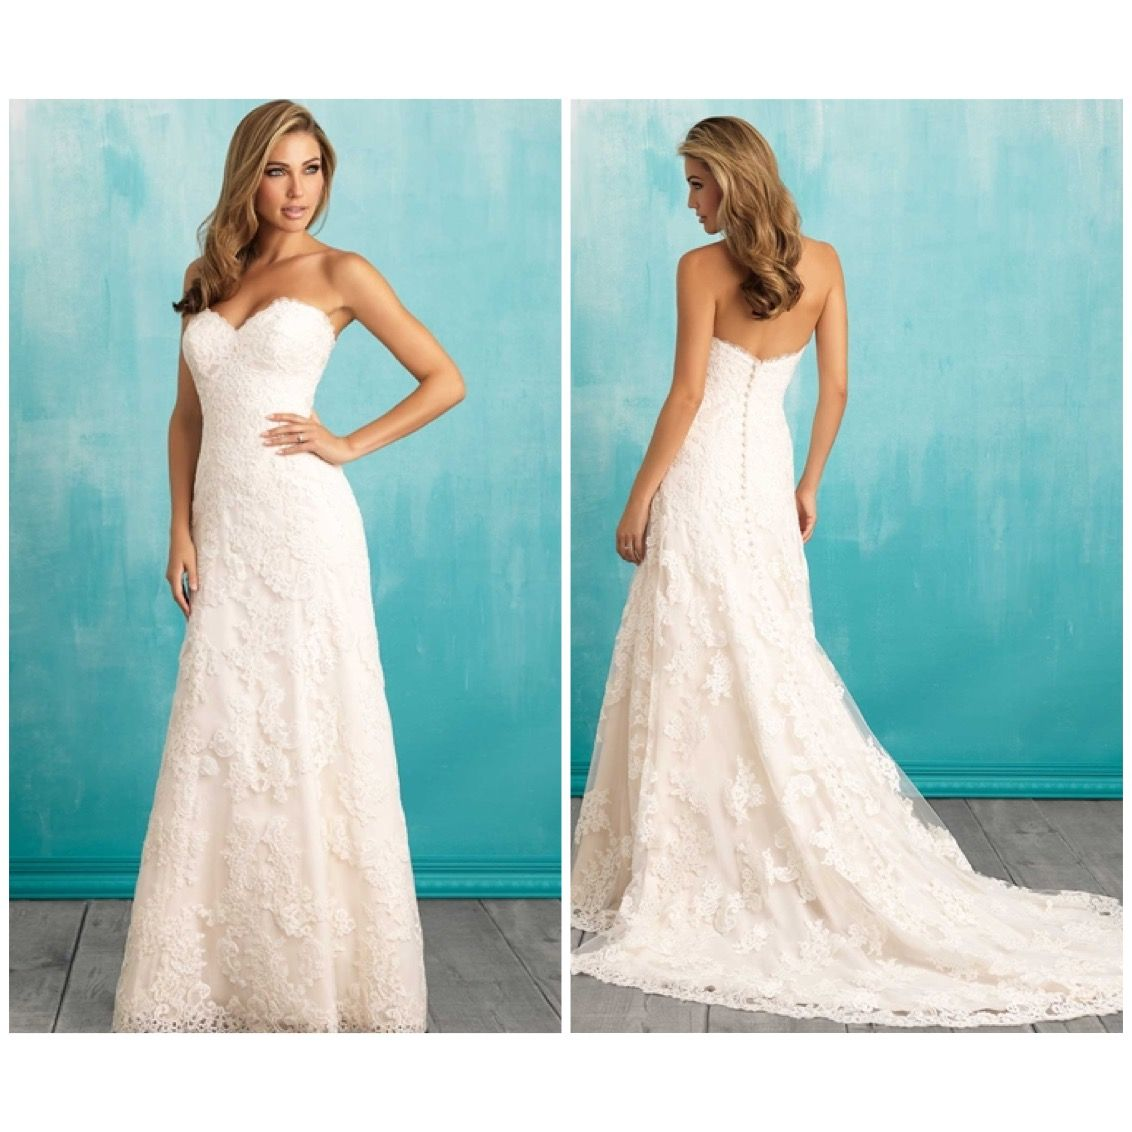 Luxury Plus Size Wedding Dress Designer Ideas - All Wedding Dresses ...